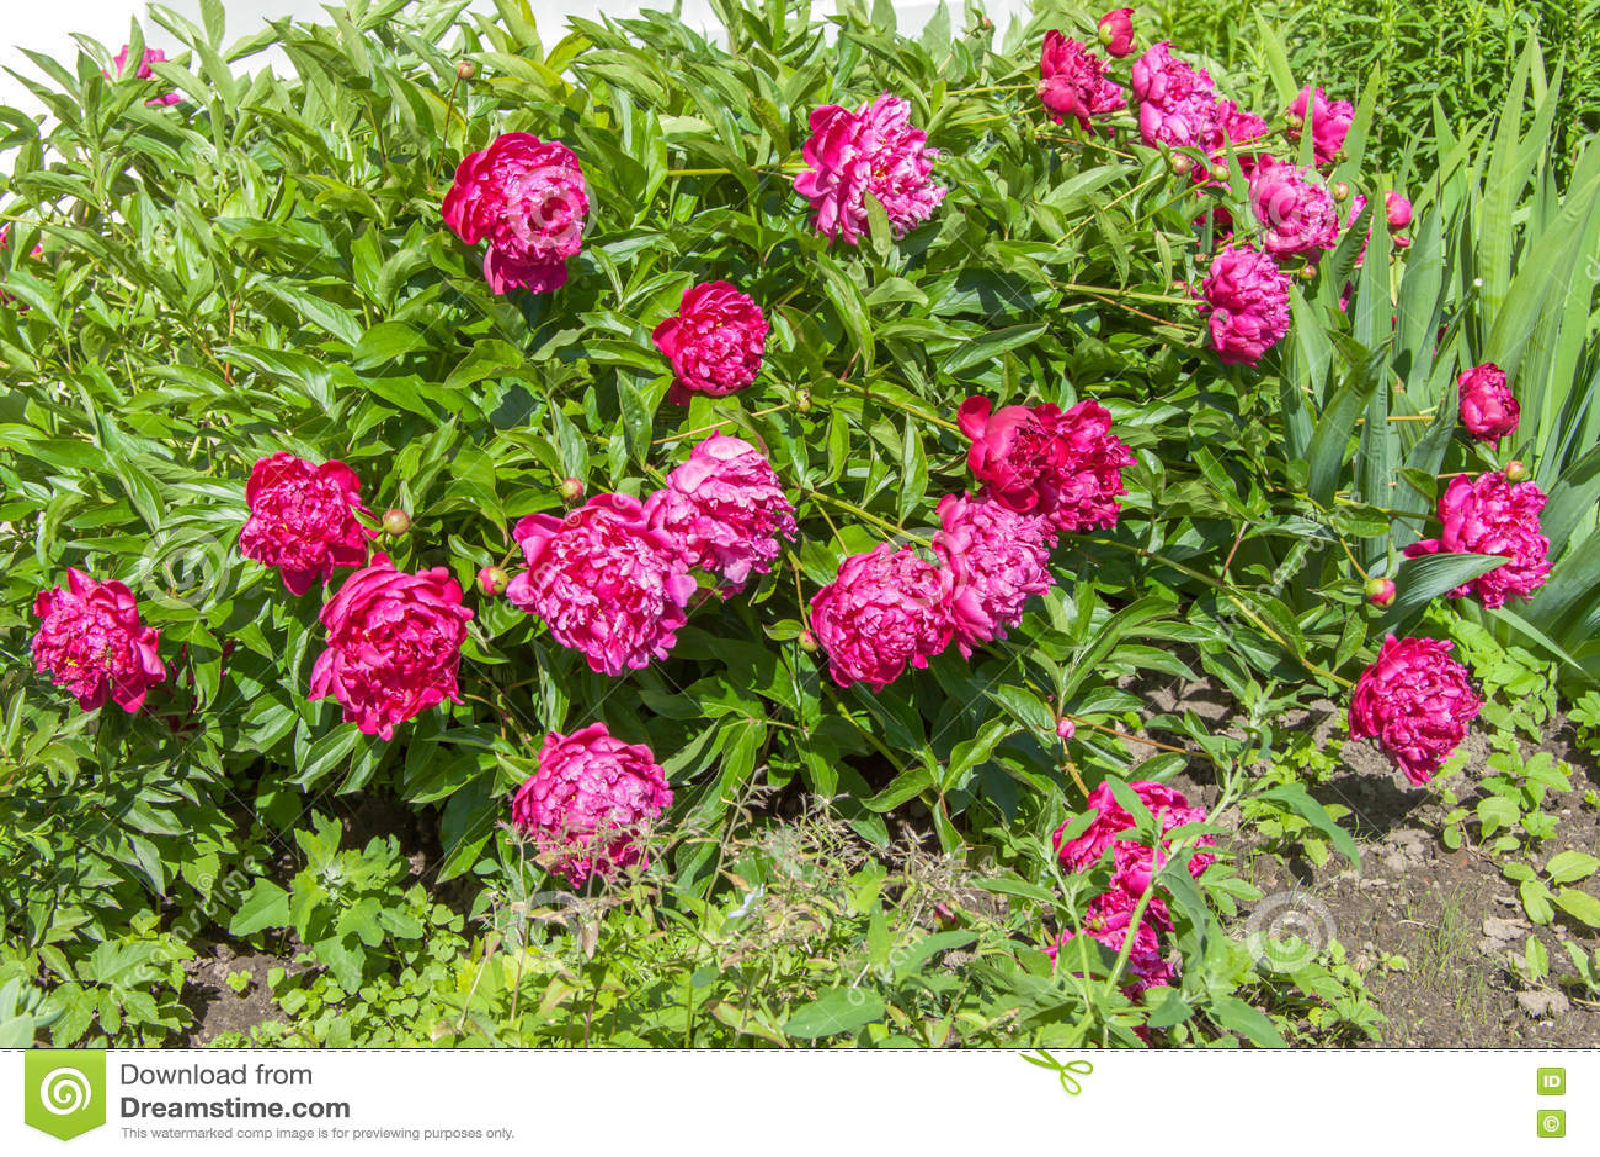 Purple Flowering Bush Peonies Stock Image Image Of Closeup